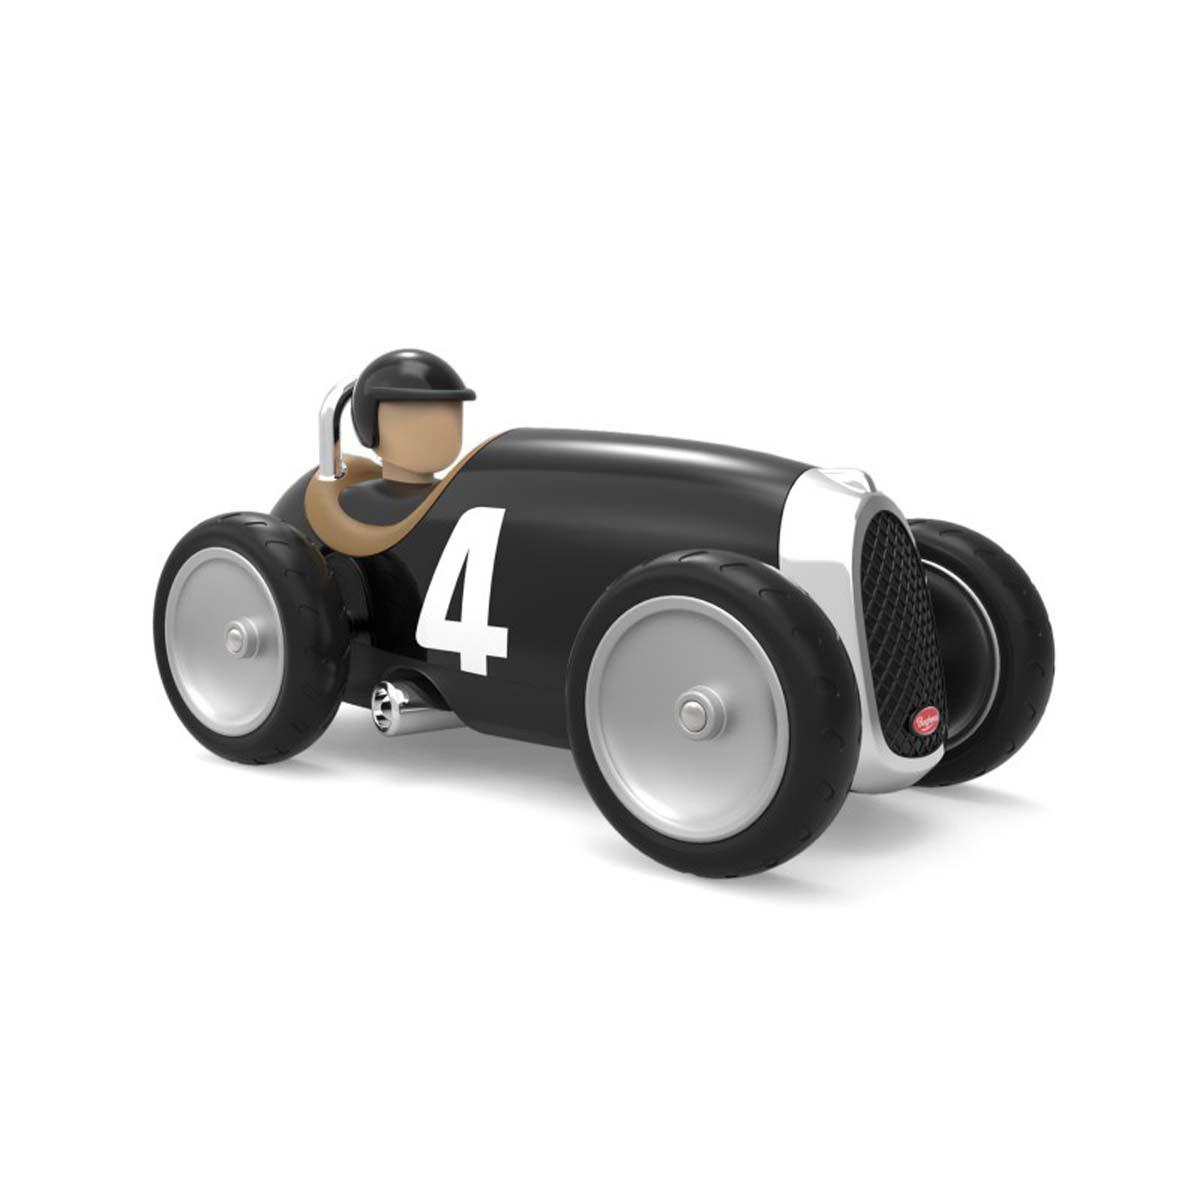 Mes premiers jouets Voiture en Métal Racing Car - Noir Voiture en Métal Racing Car - Noir